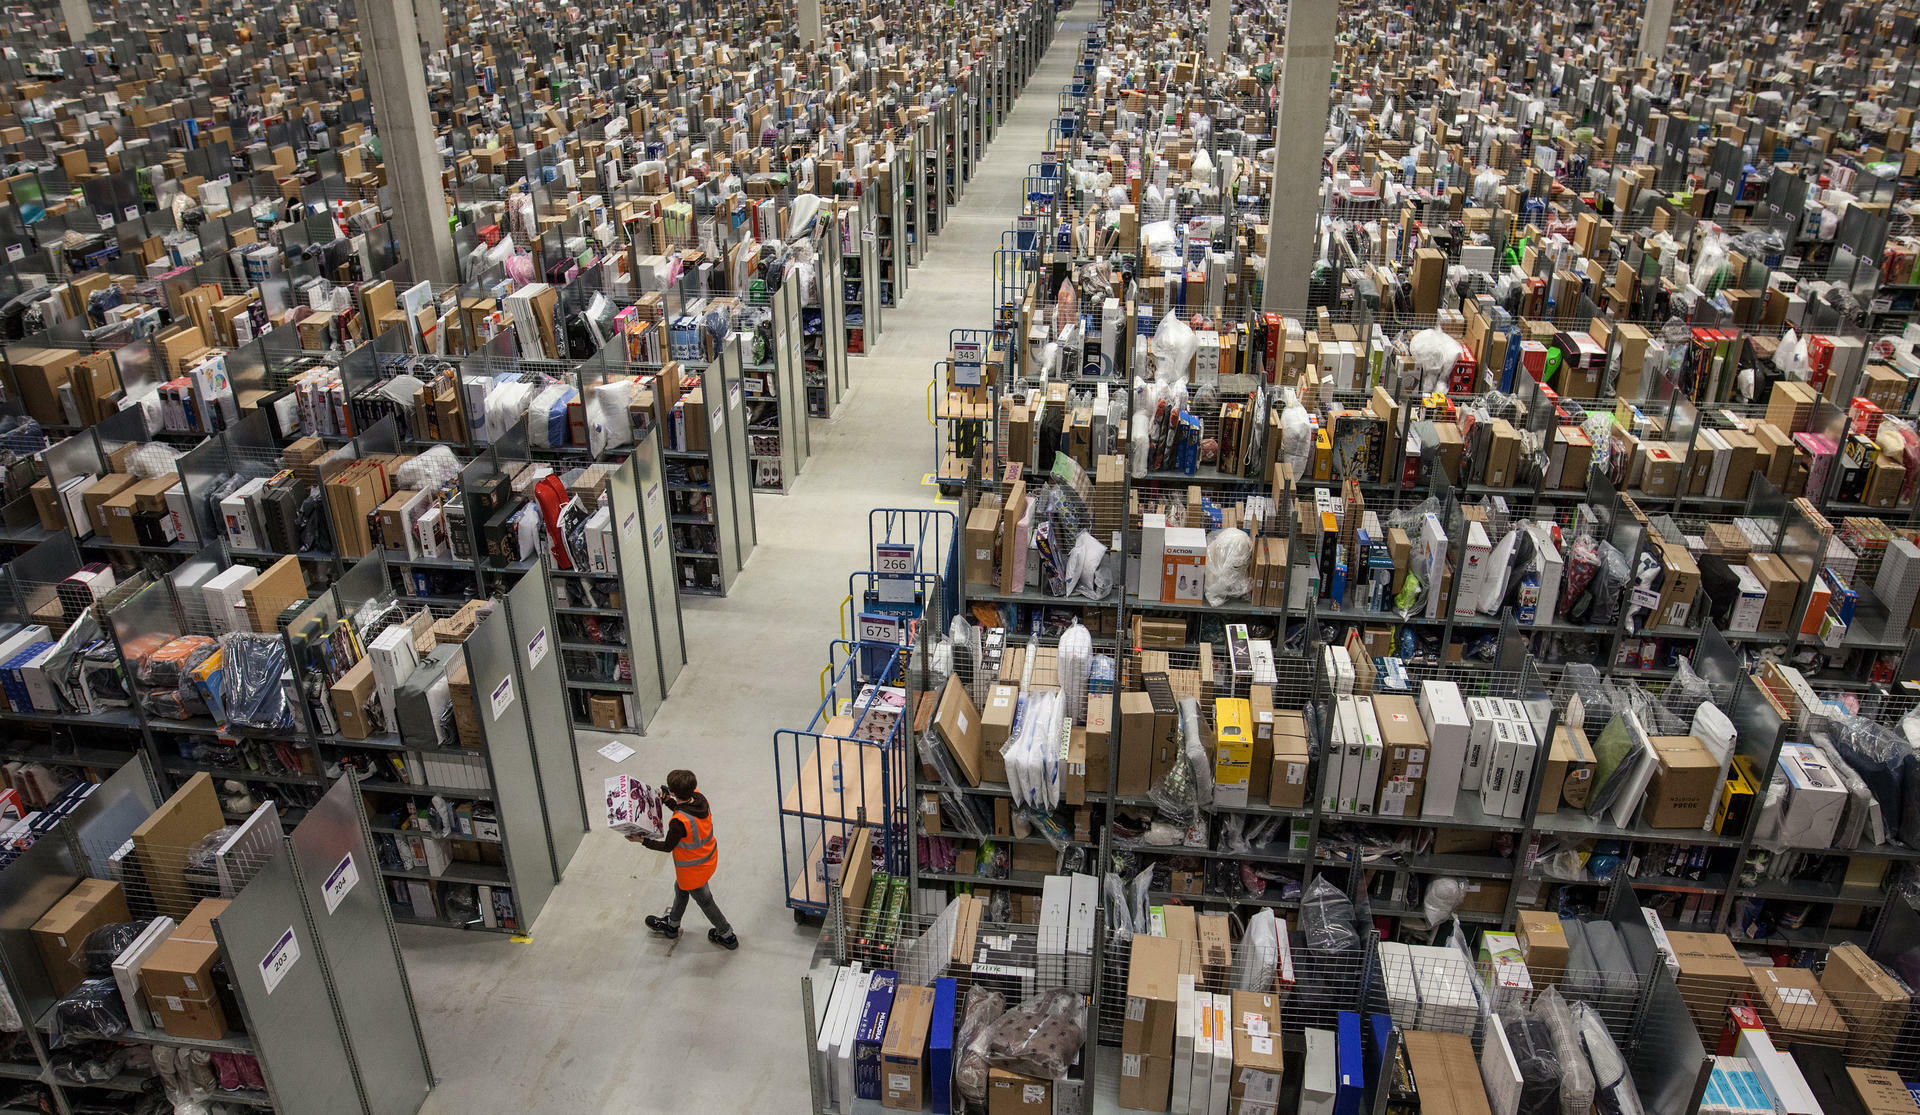 e7c1de48839dfb Studie zu E-Commerce  Die großen Drei dominieren den Online-Handel